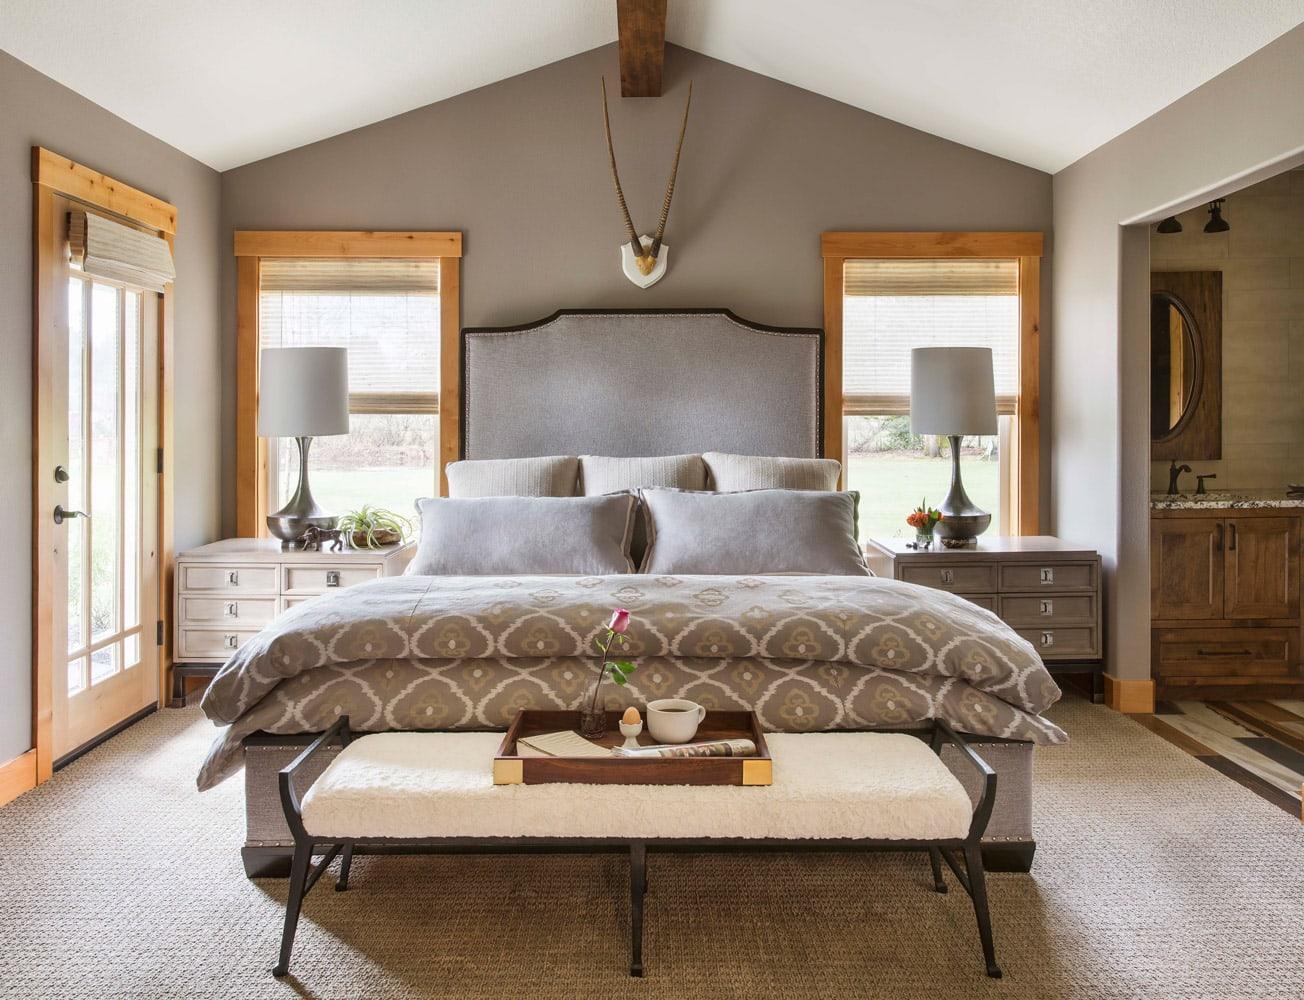 Whimsical Farmhouse Bedroom Interior Design bed lamps carpet windows